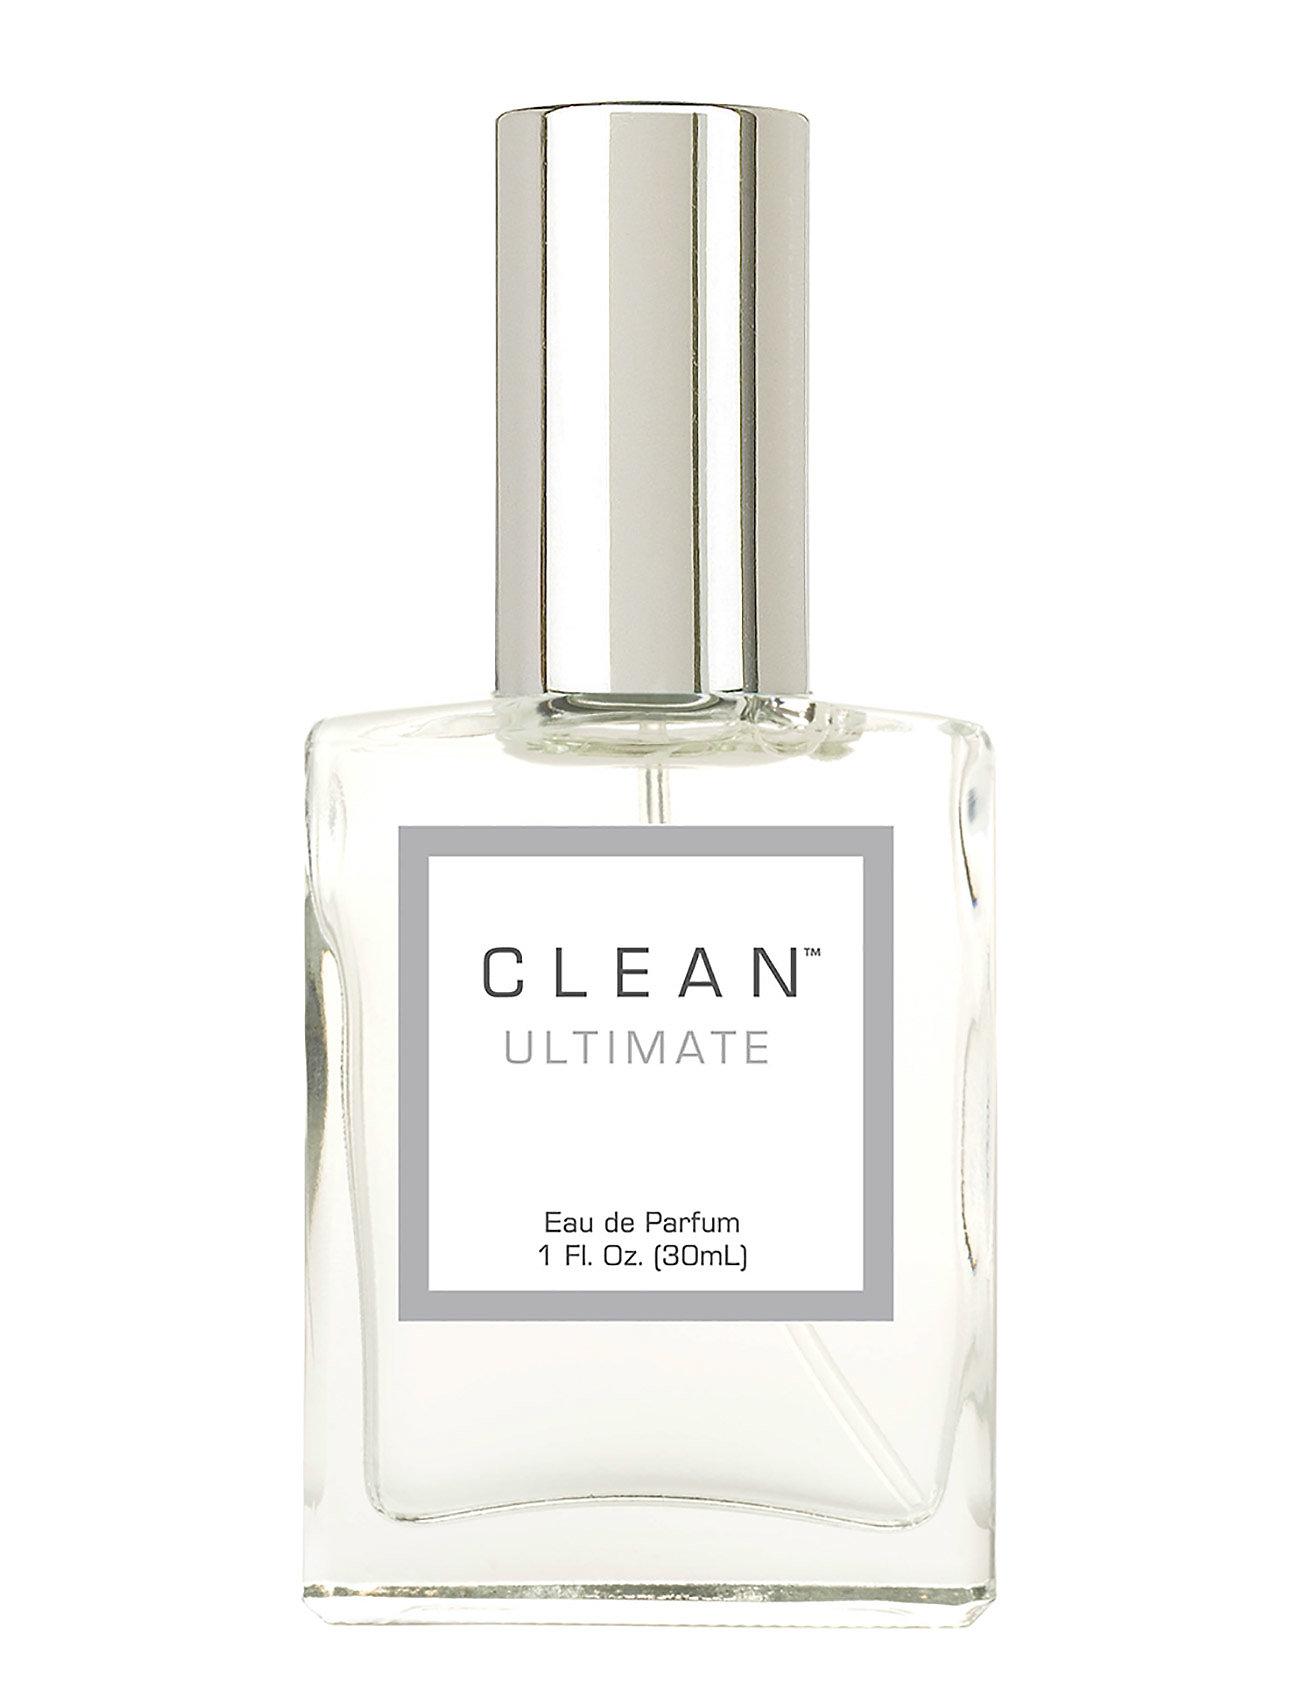 clean – Ultimate fra boozt.com dk